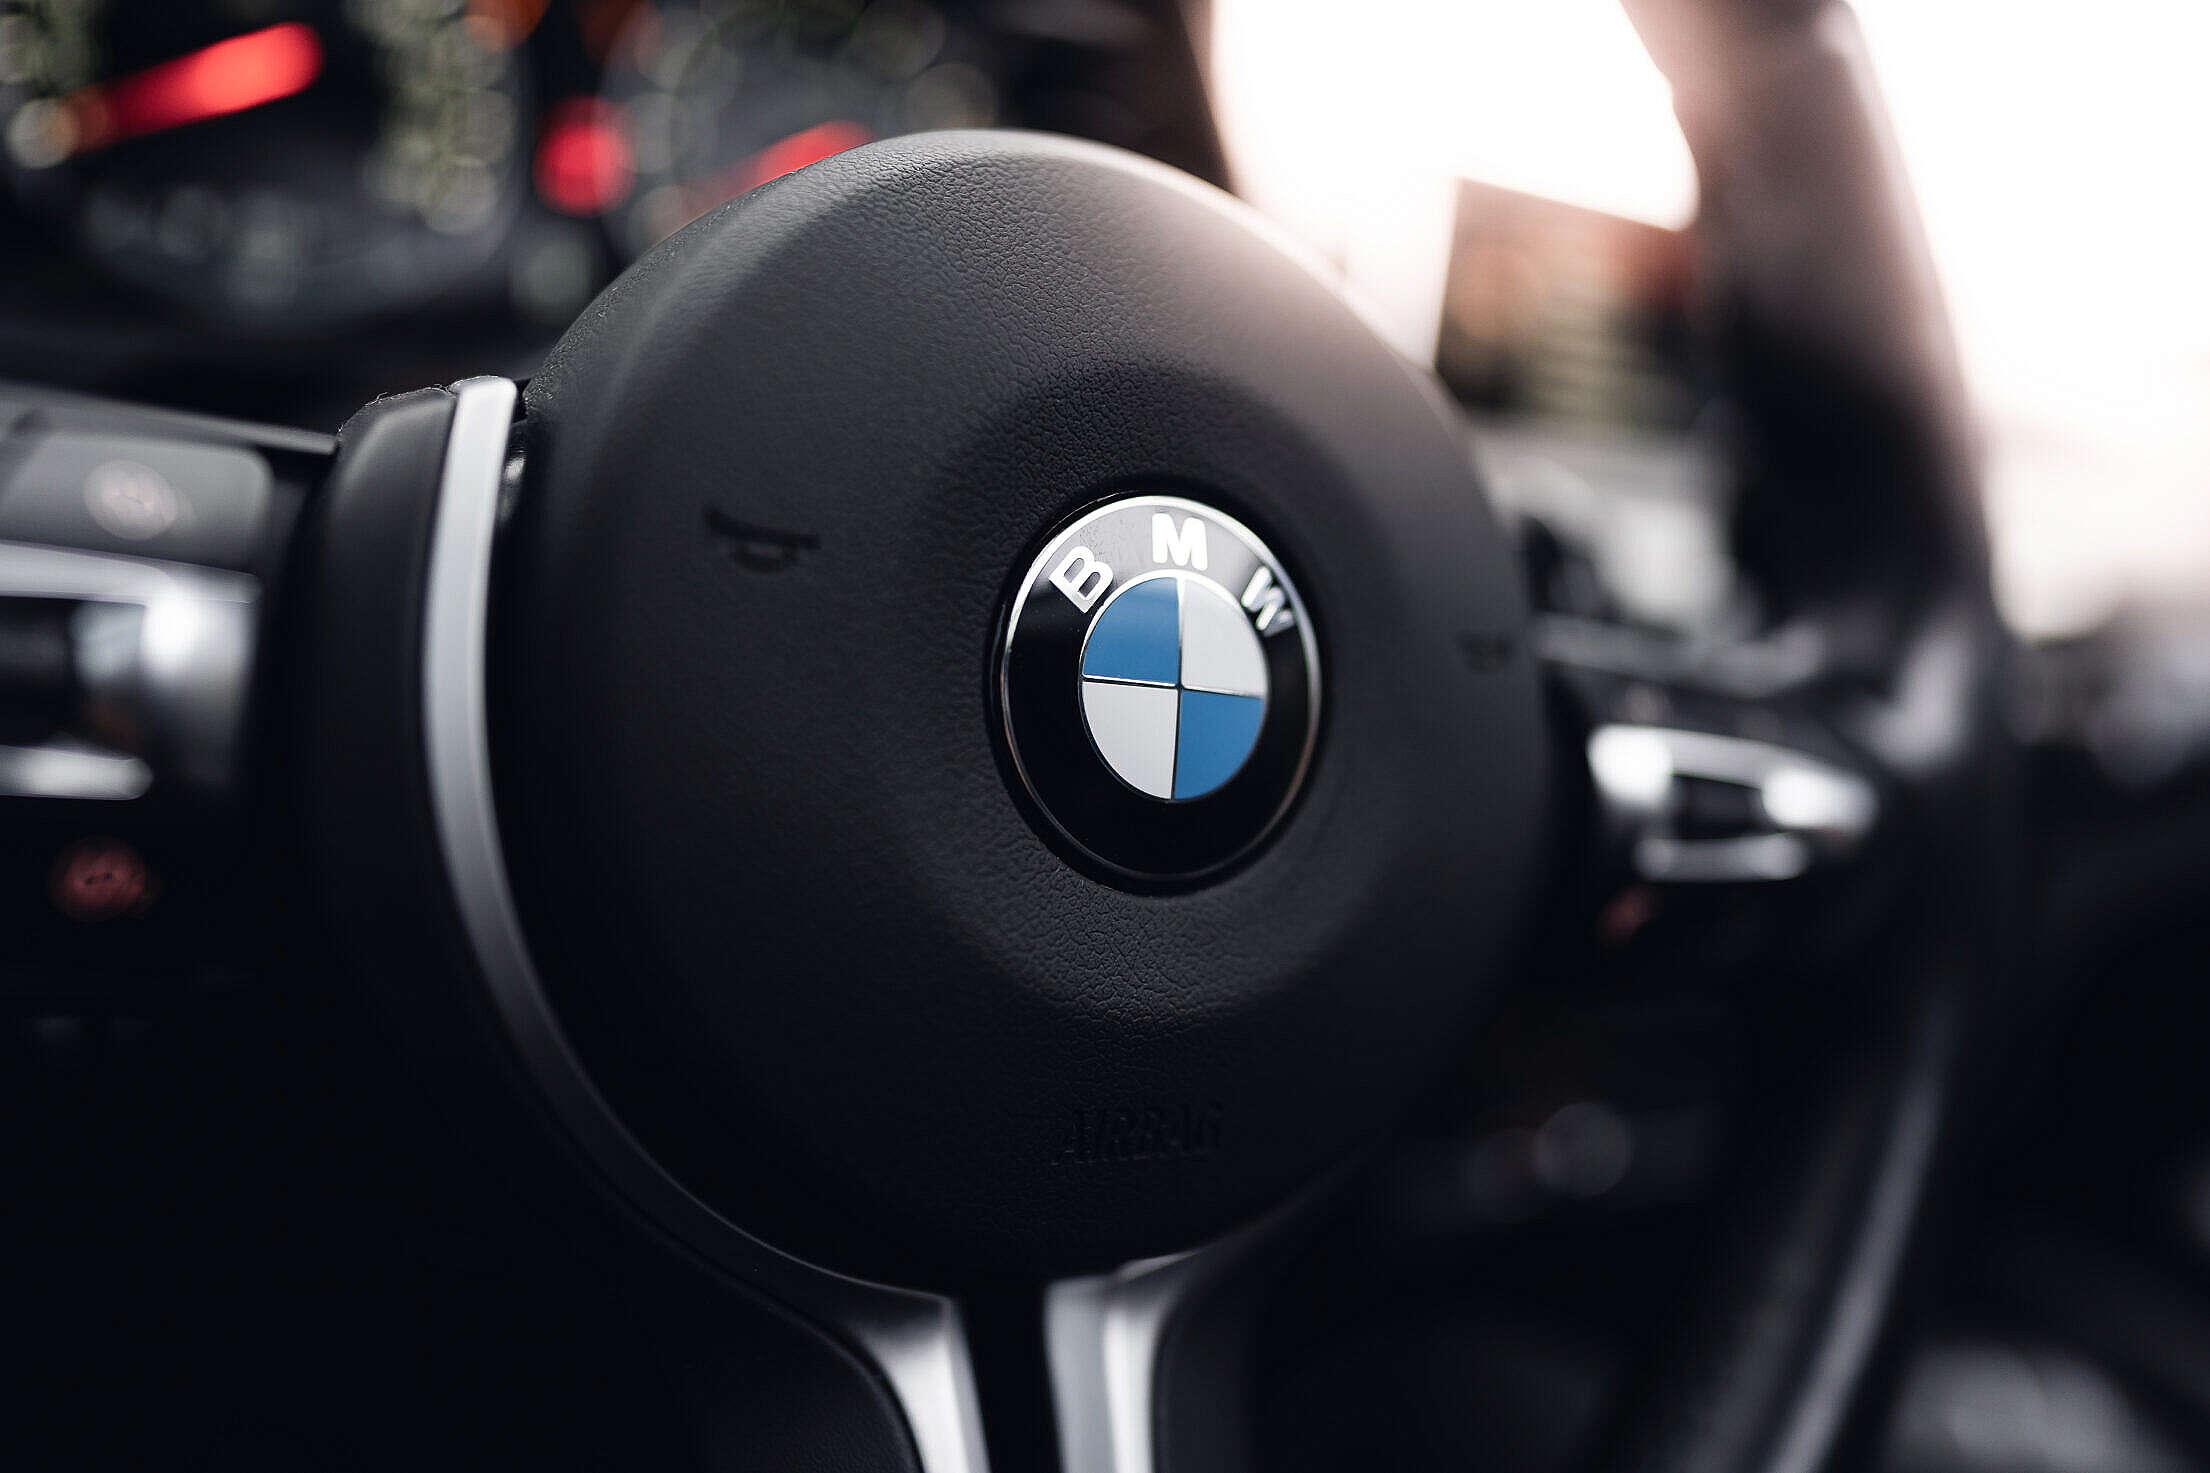 BMW Logo on The Steering Wheel Free Stock Photo